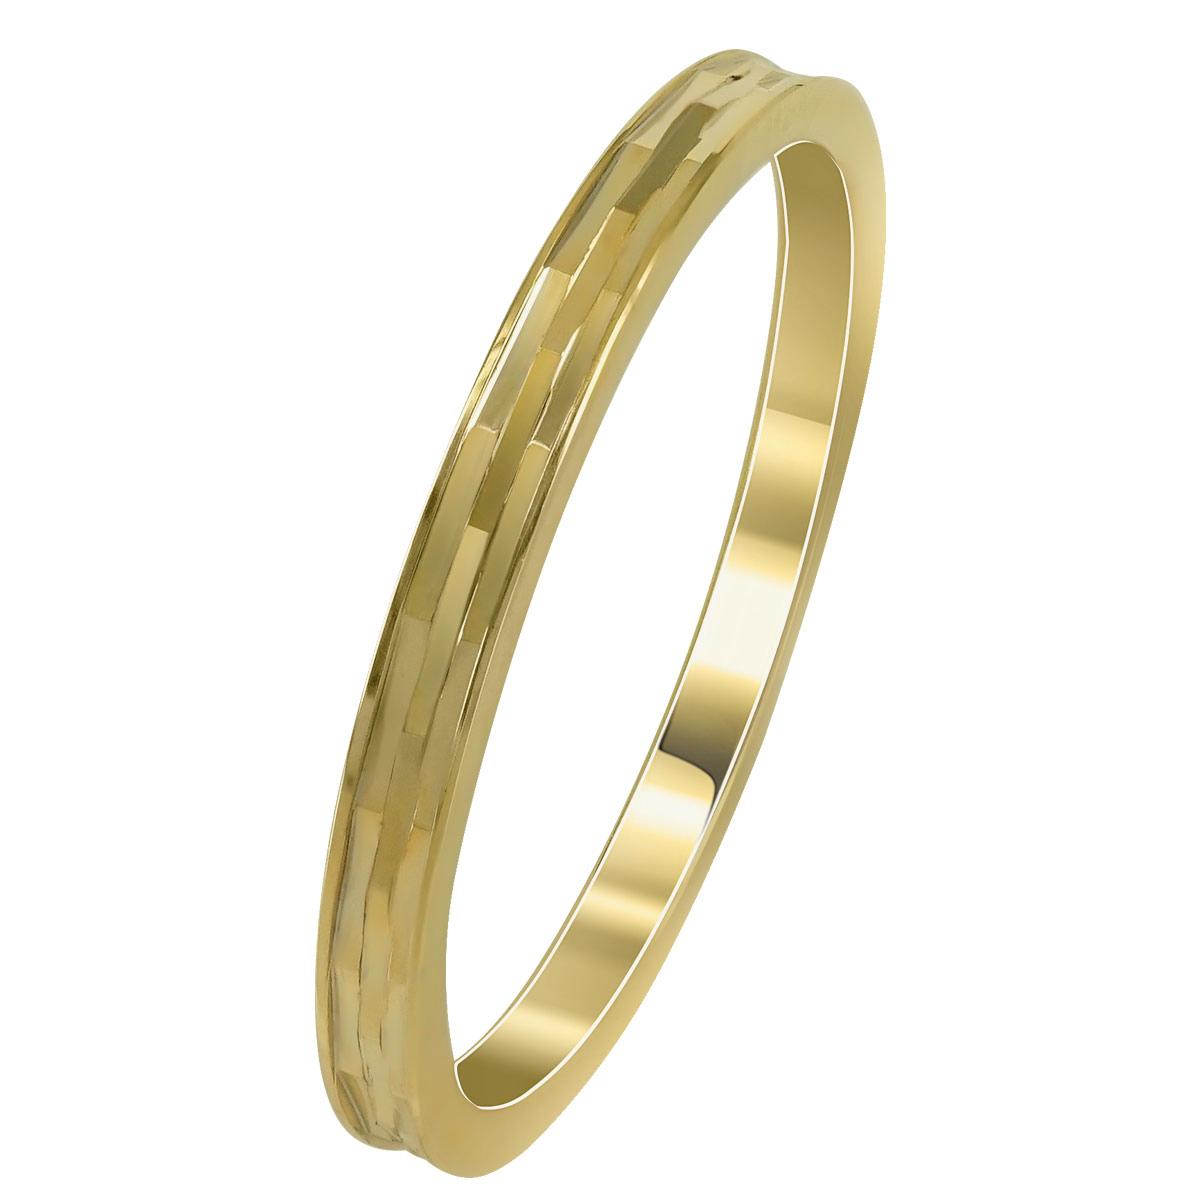 Kίτρινη Χρυσή Βέρα Γάμου WR258 k14